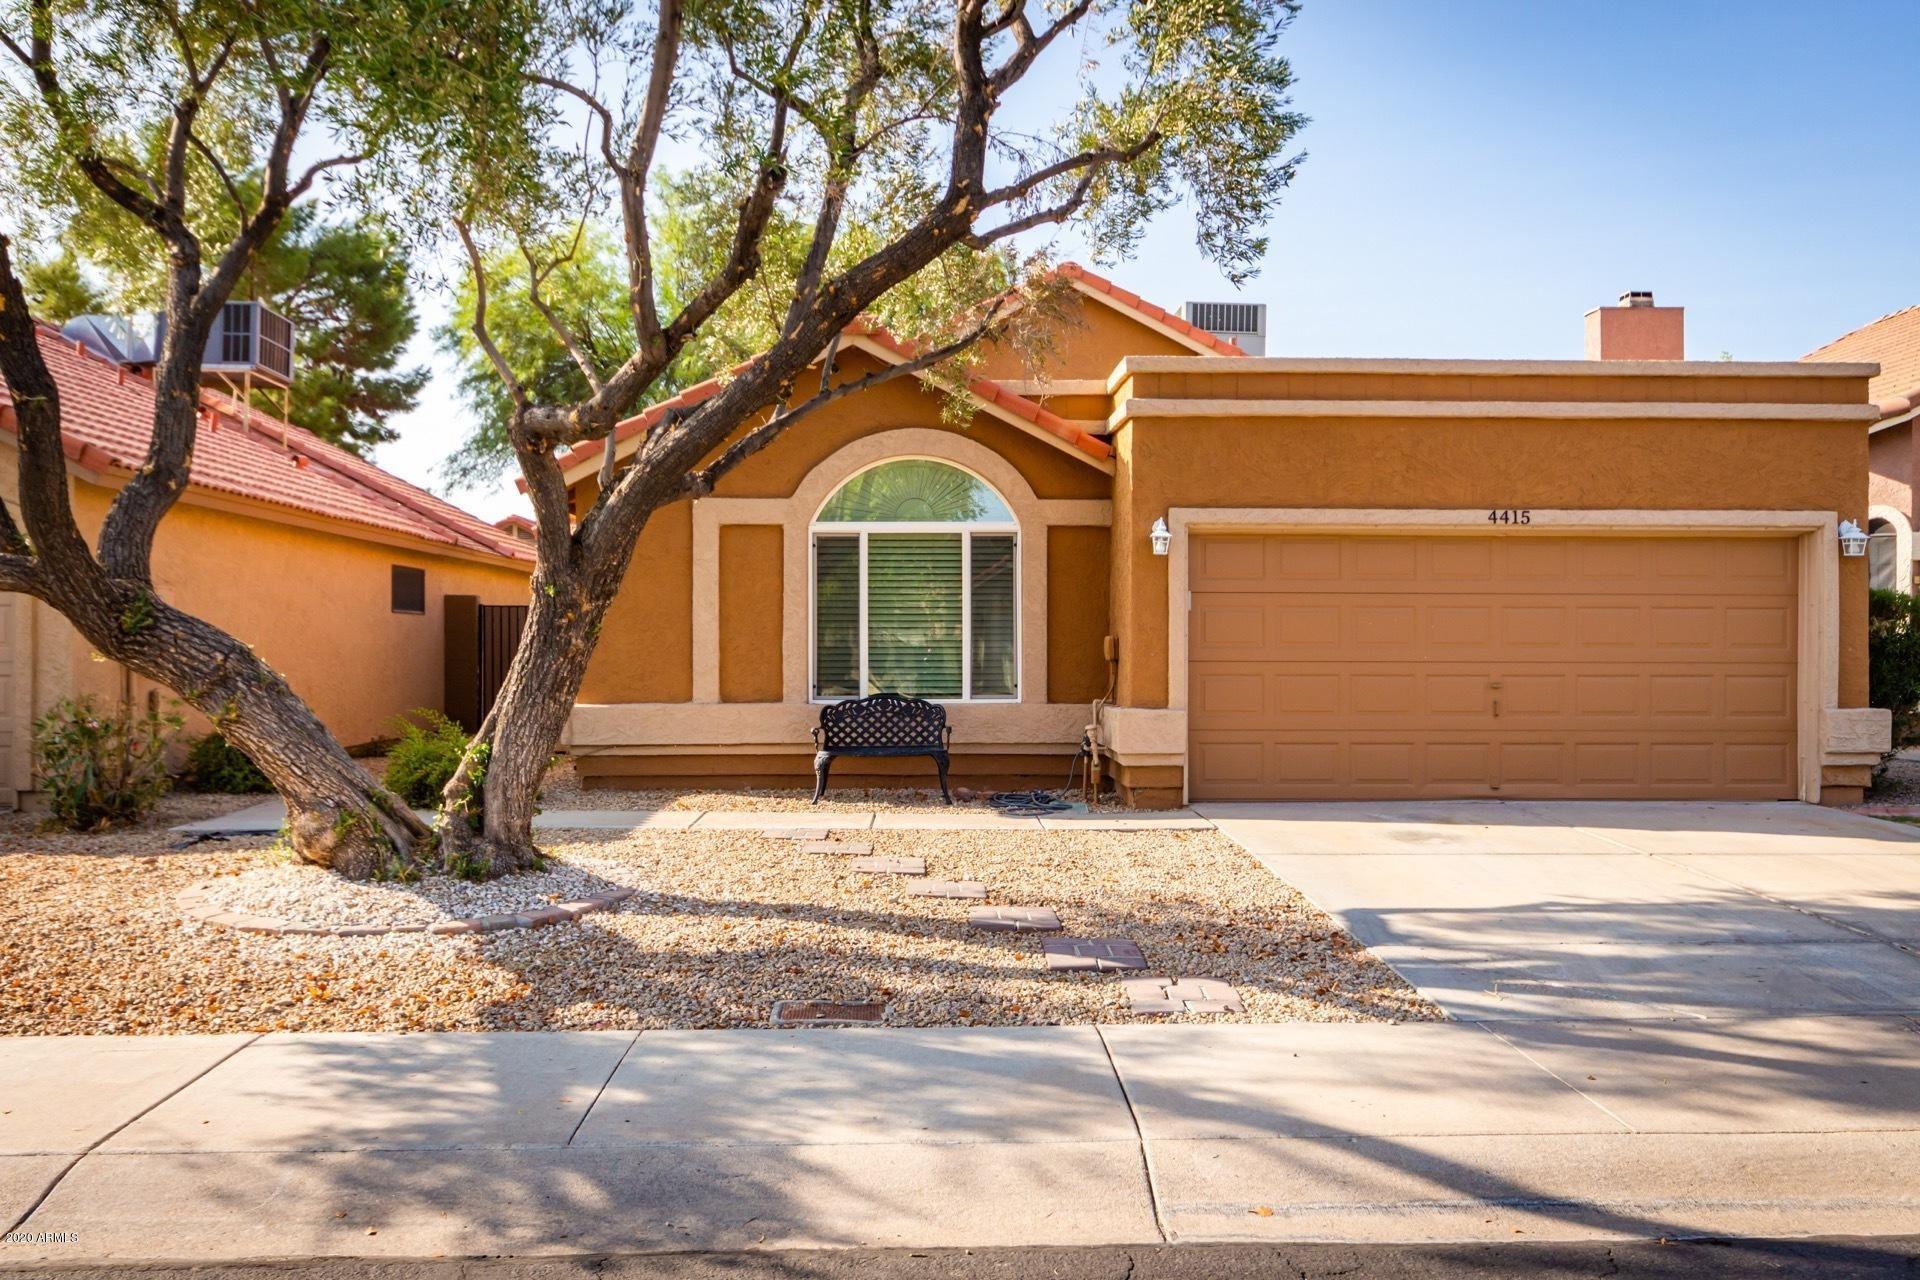 4415 E TANGLEWOOD Drive, Phoenix, AZ 85048 - MLS#: 6134004